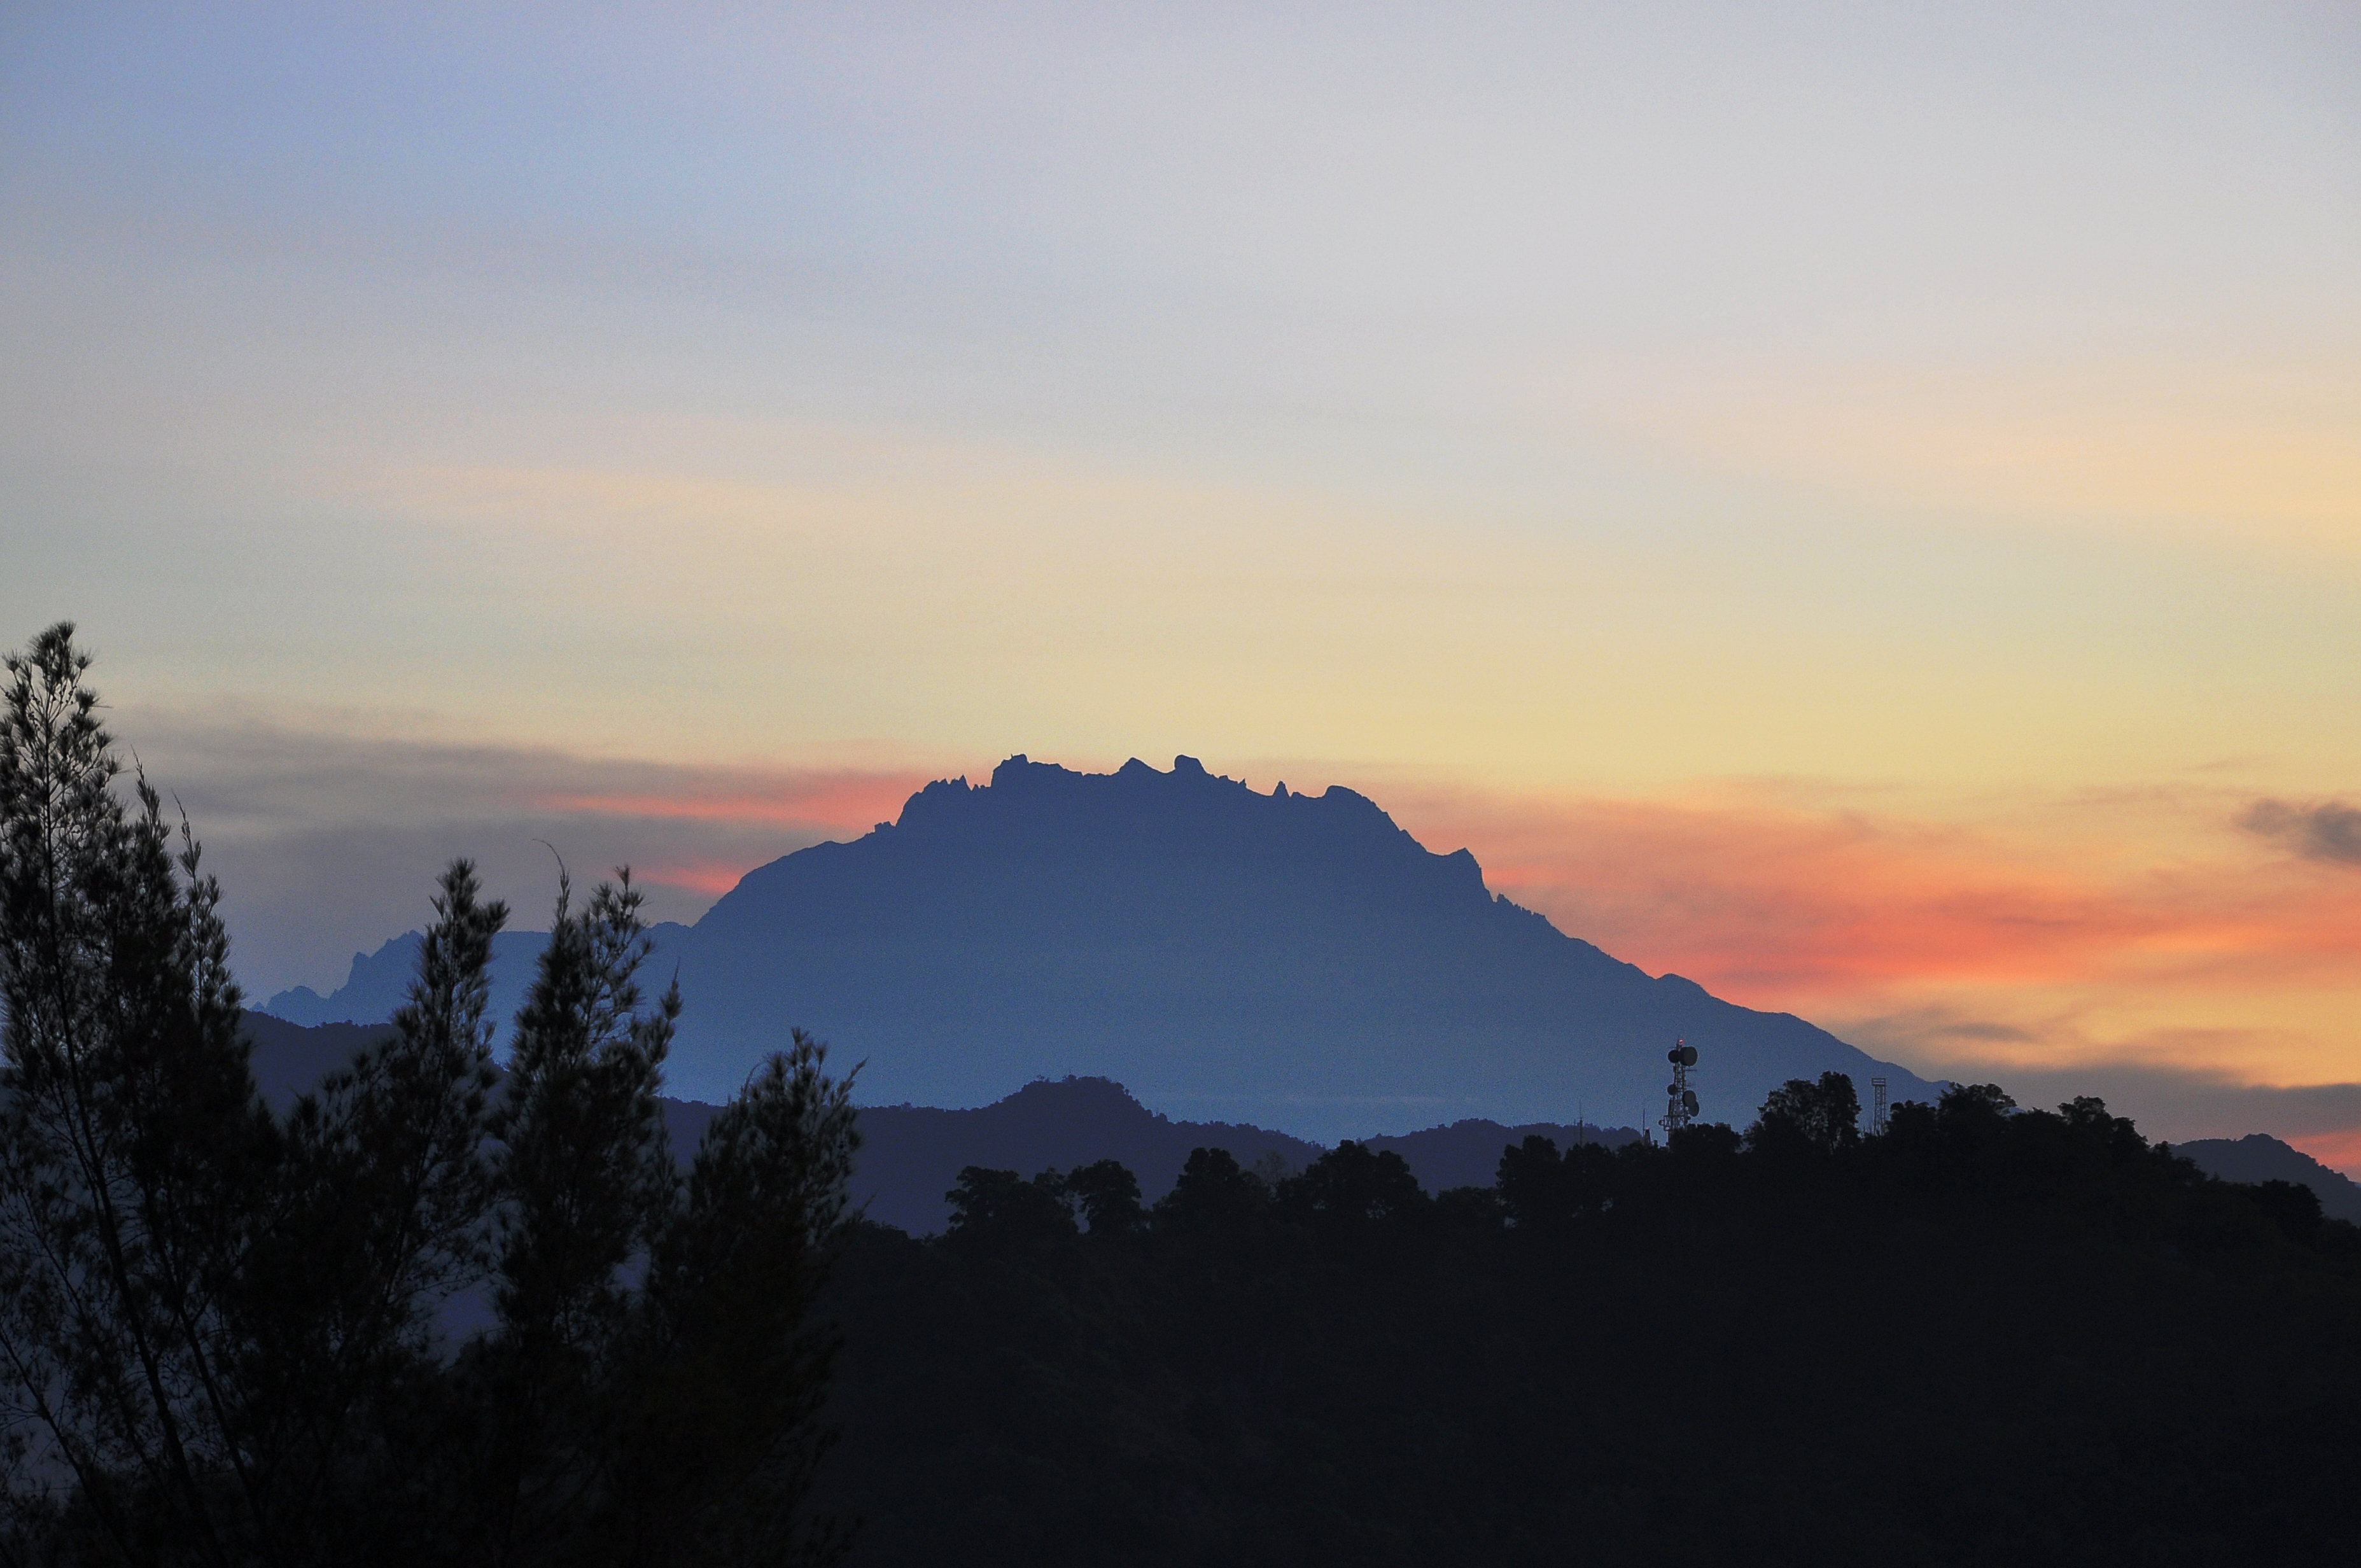 Mount_Kinabalu_sunrise_silhouette